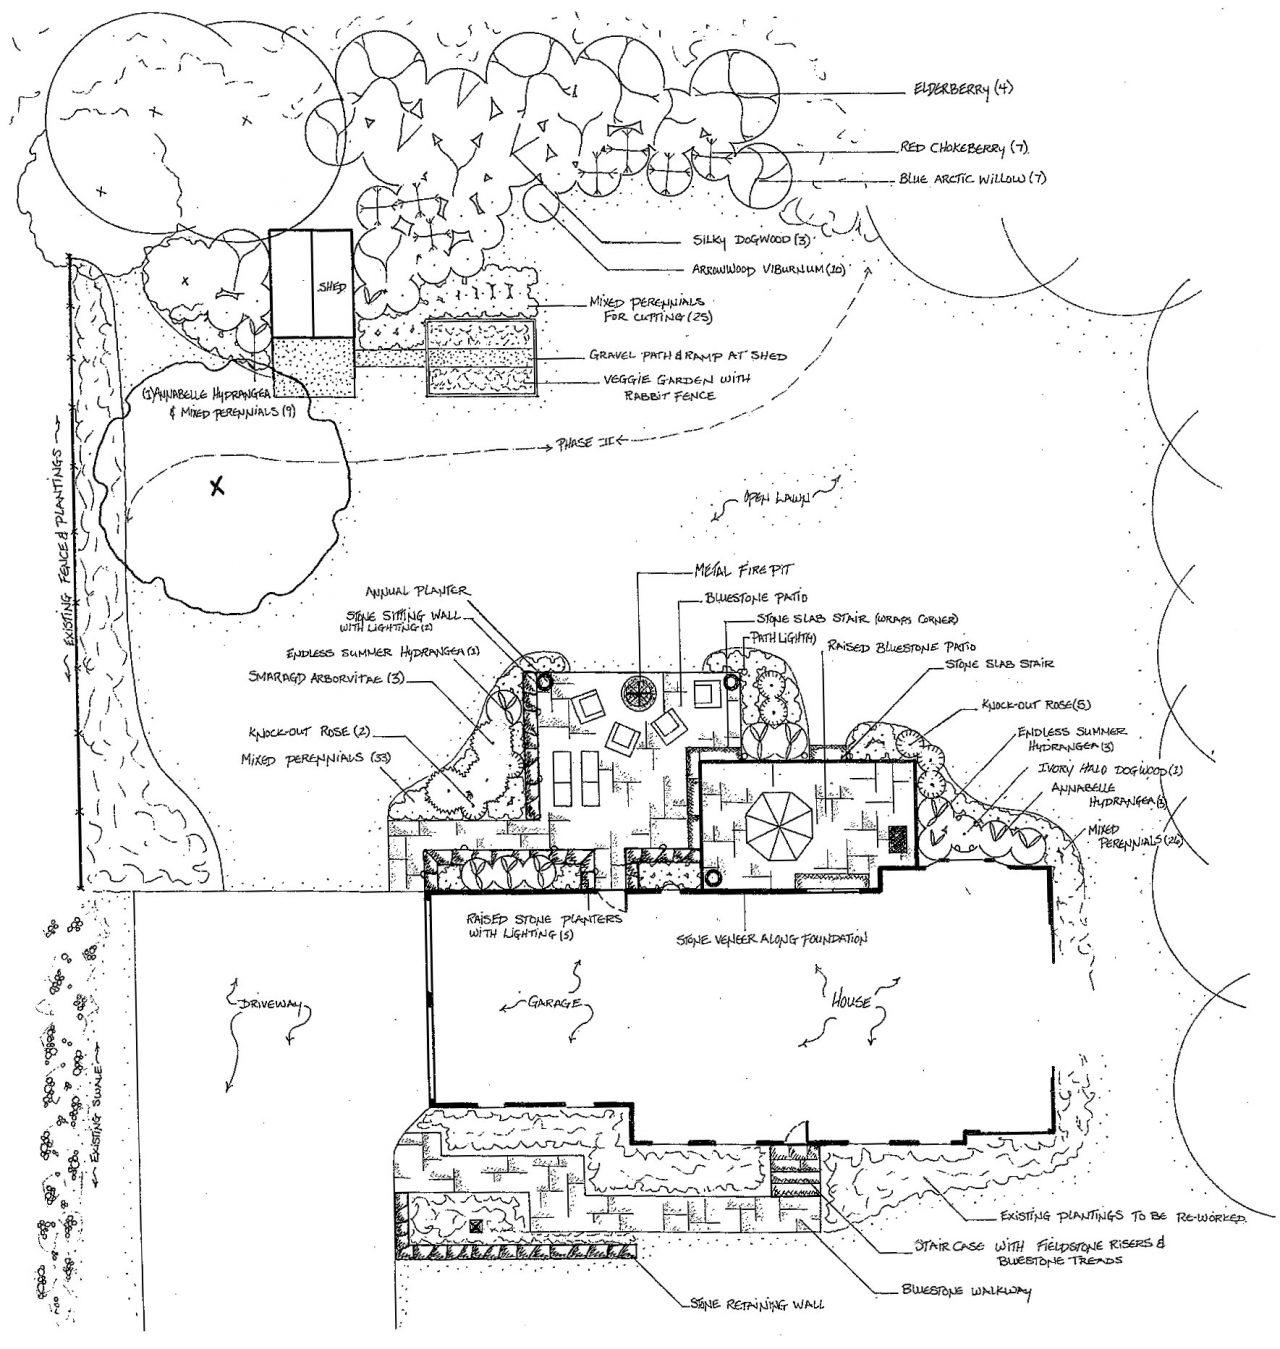 di stefano Landscaping Stone Patio Design Plan